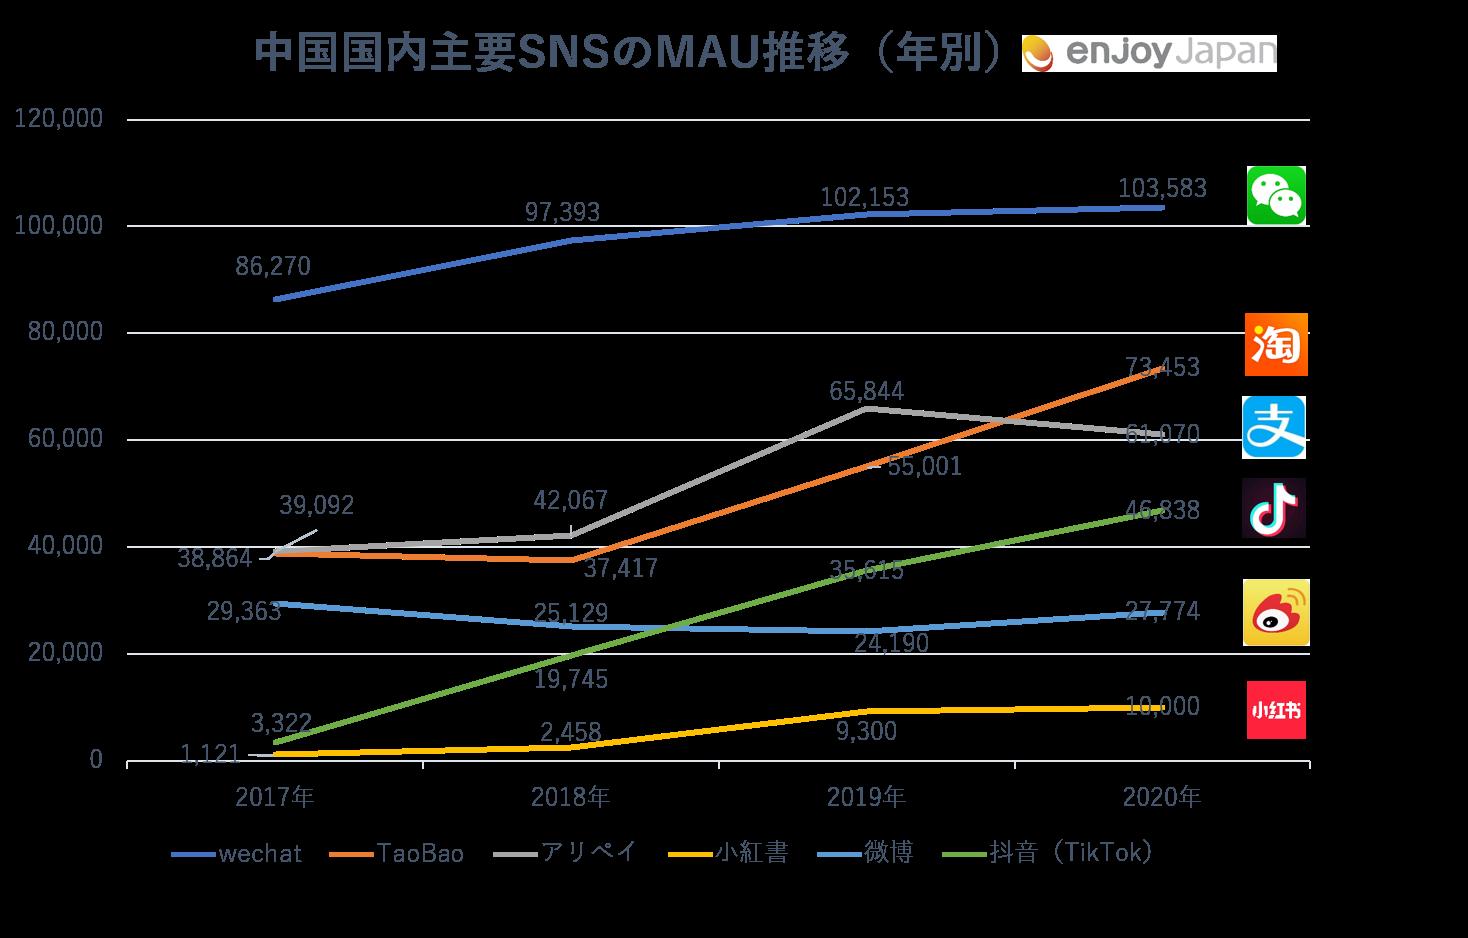 中国国内主要SNSのMAU推移(年別)